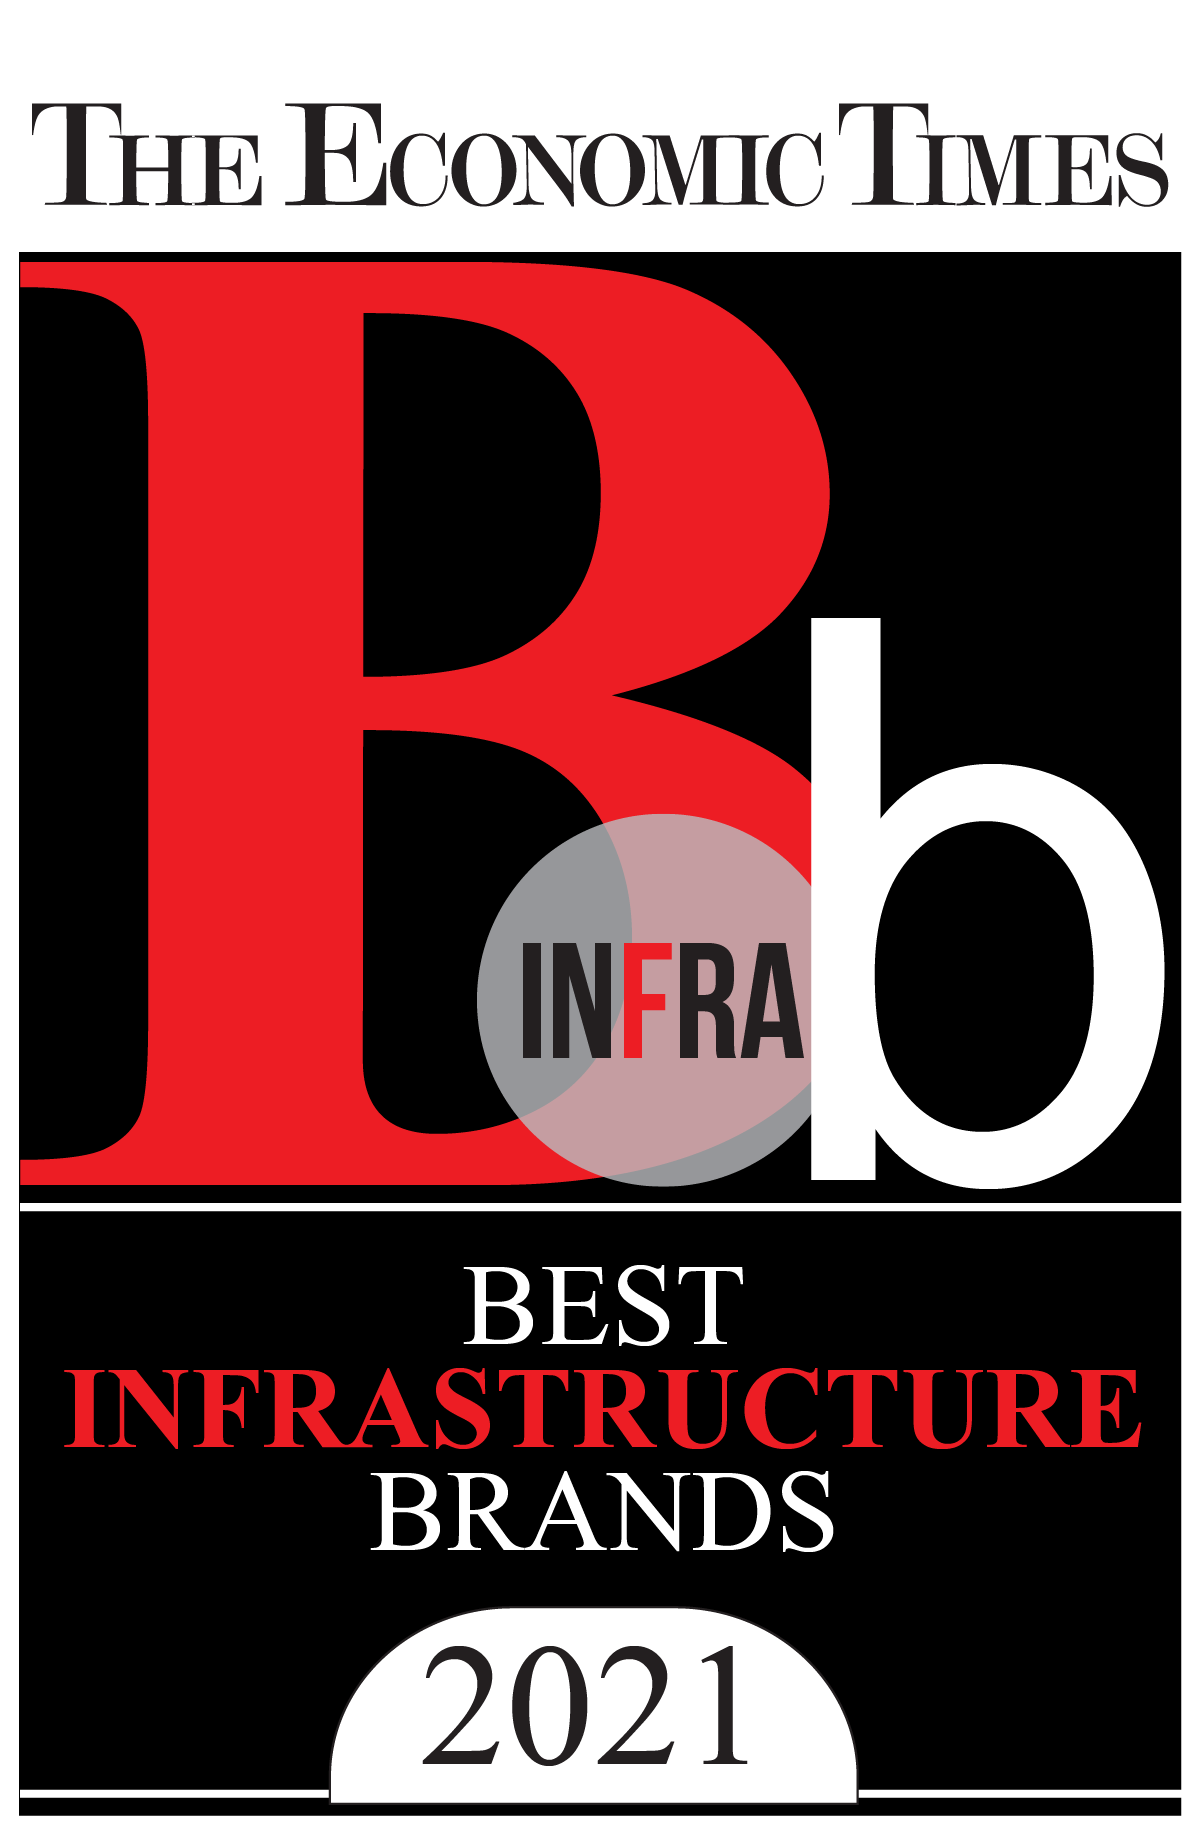 Economic Times Best Infrastructure Brand